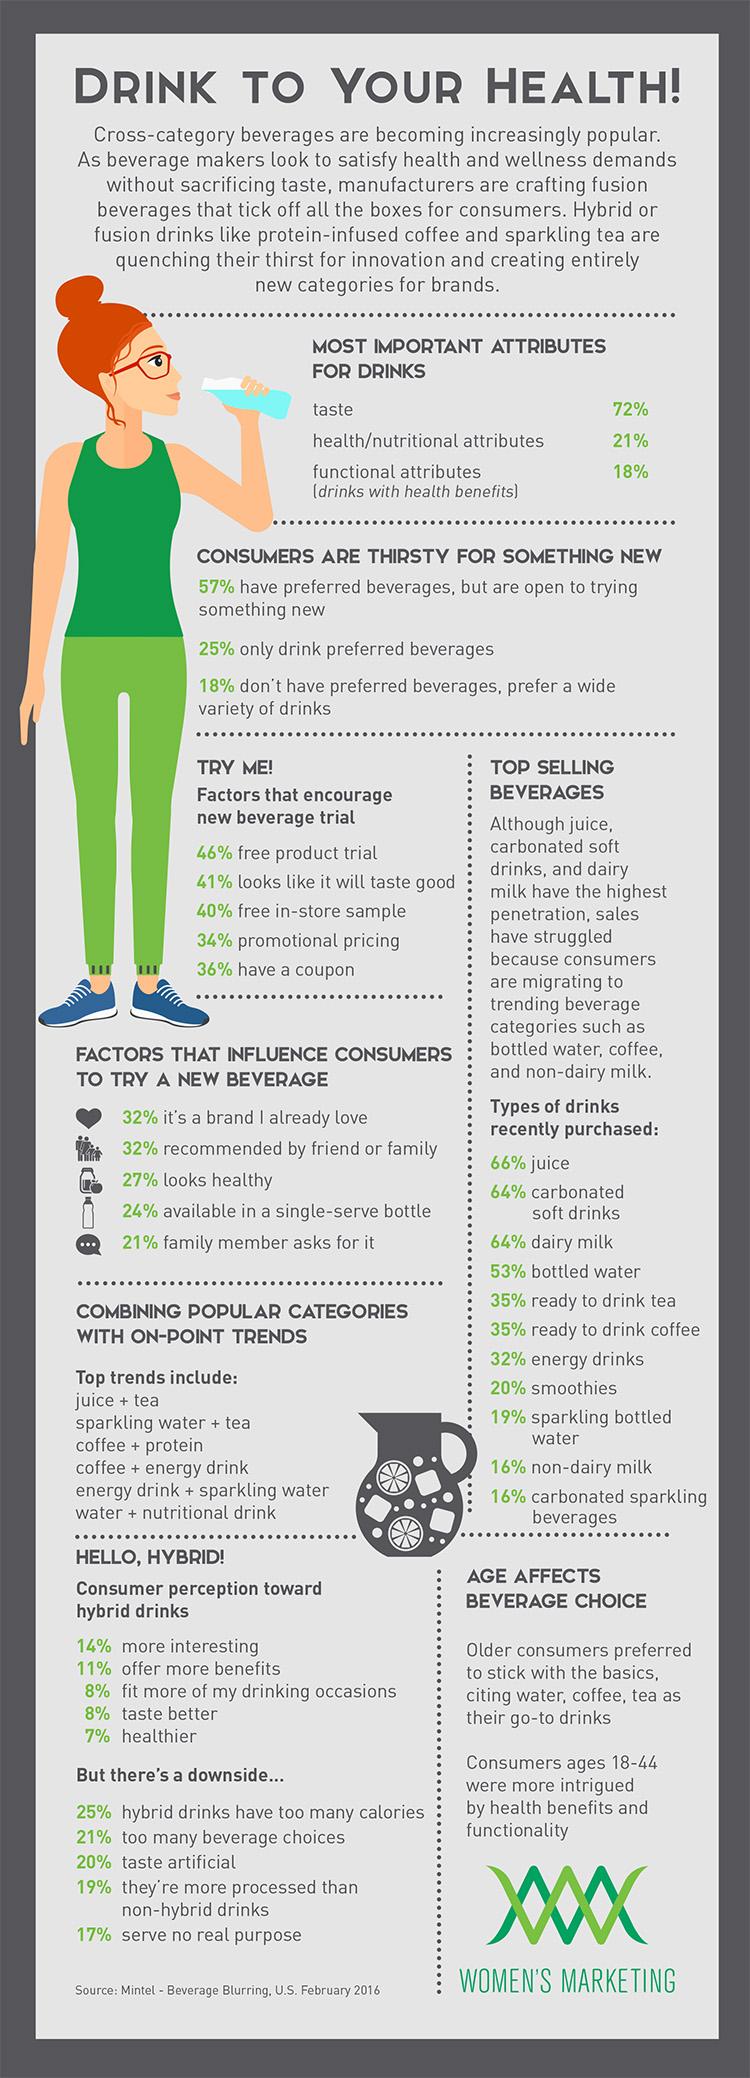 DrinkToYourHealth_Infographic.jpg